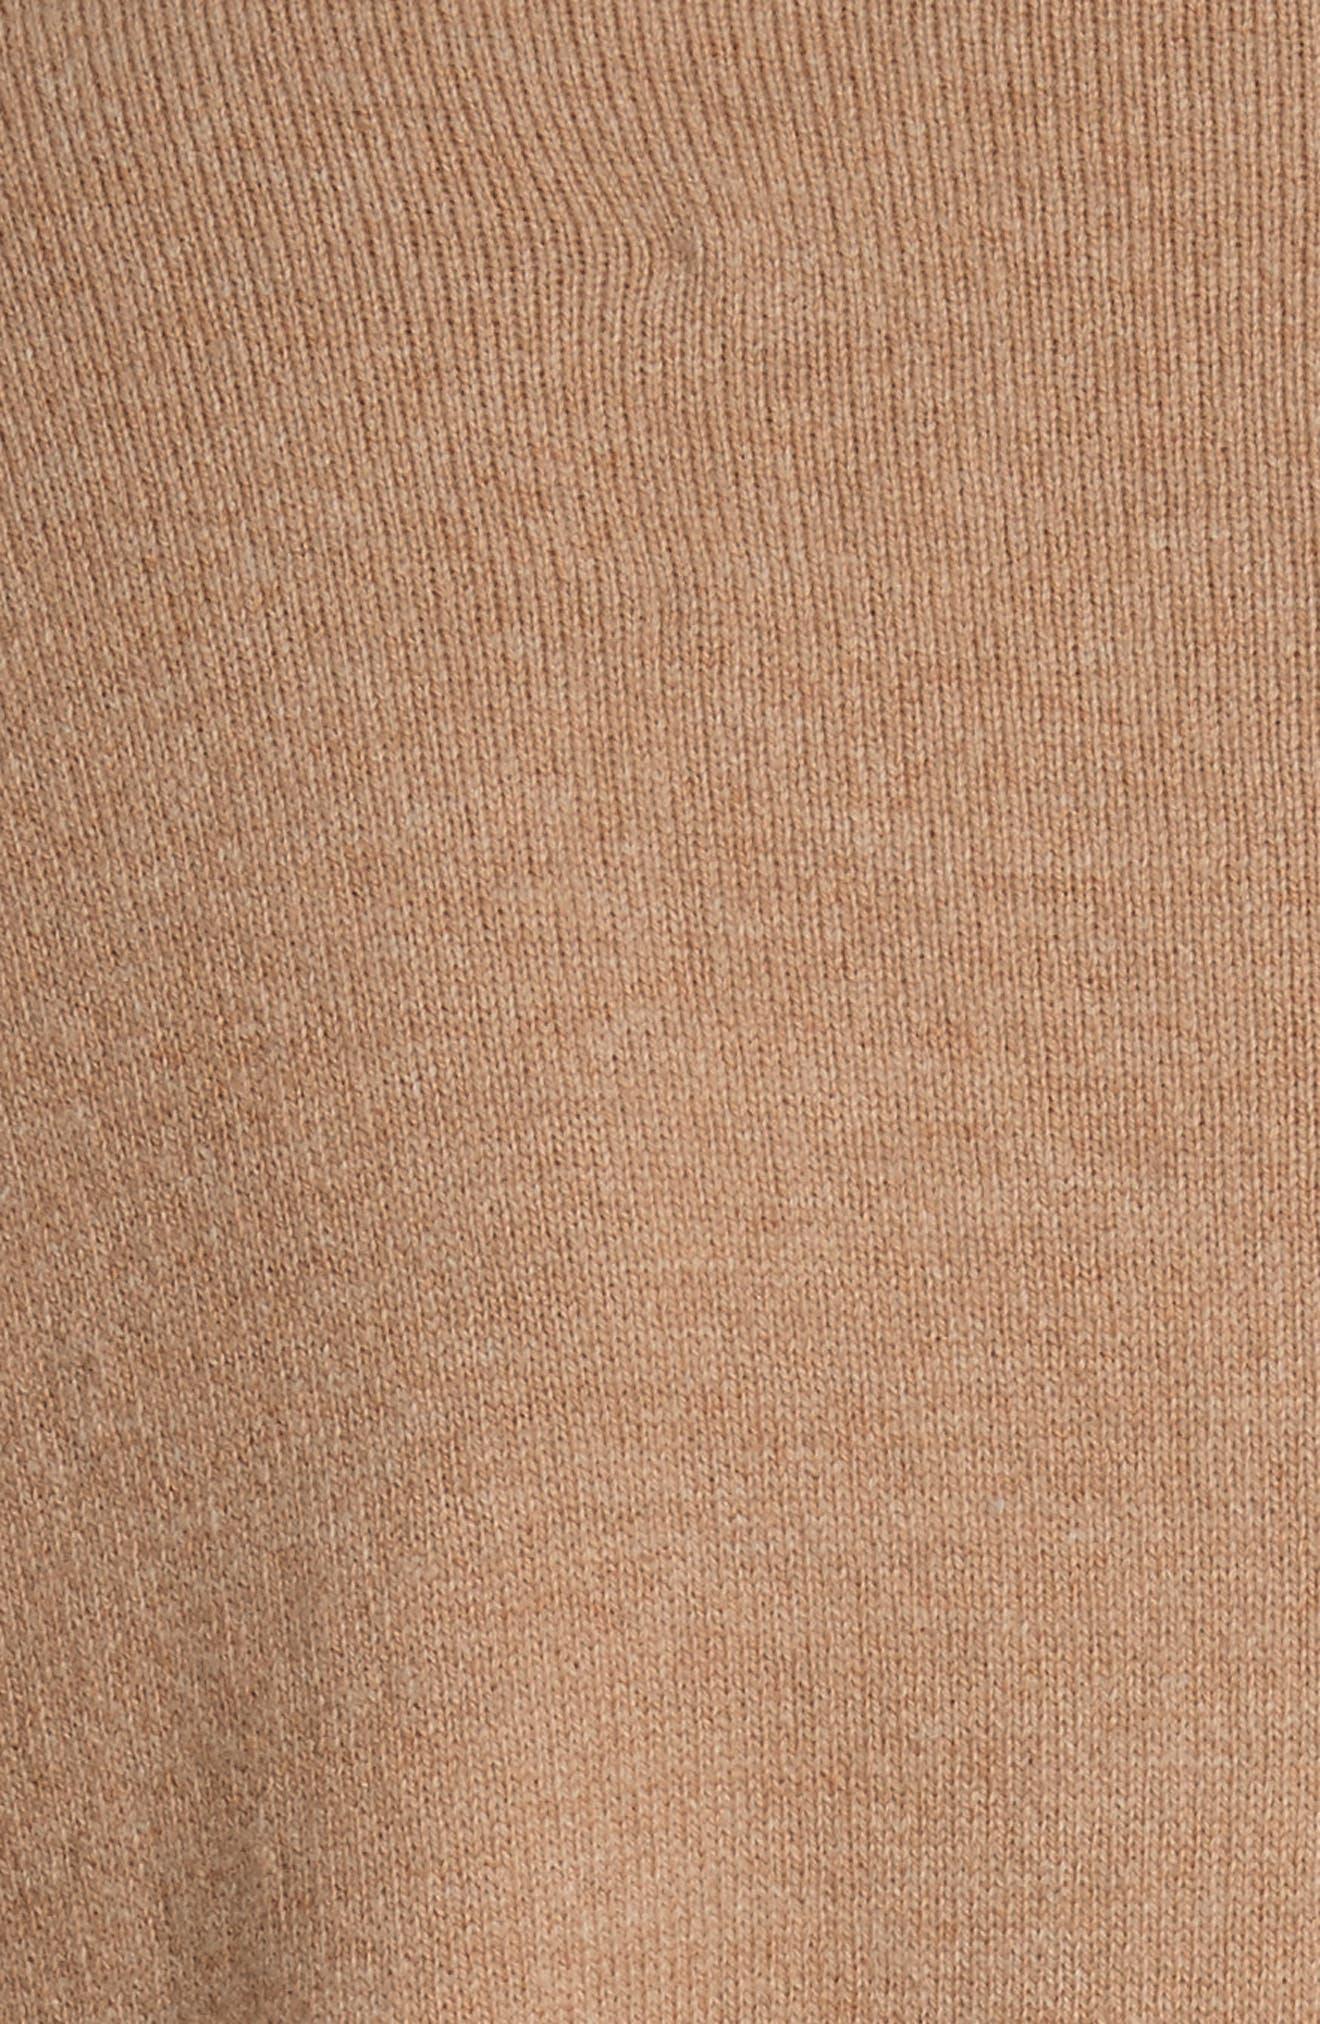 Piota Wool Blend Knit Trench Coat,                             Alternate thumbnail 6, color,                             Camel